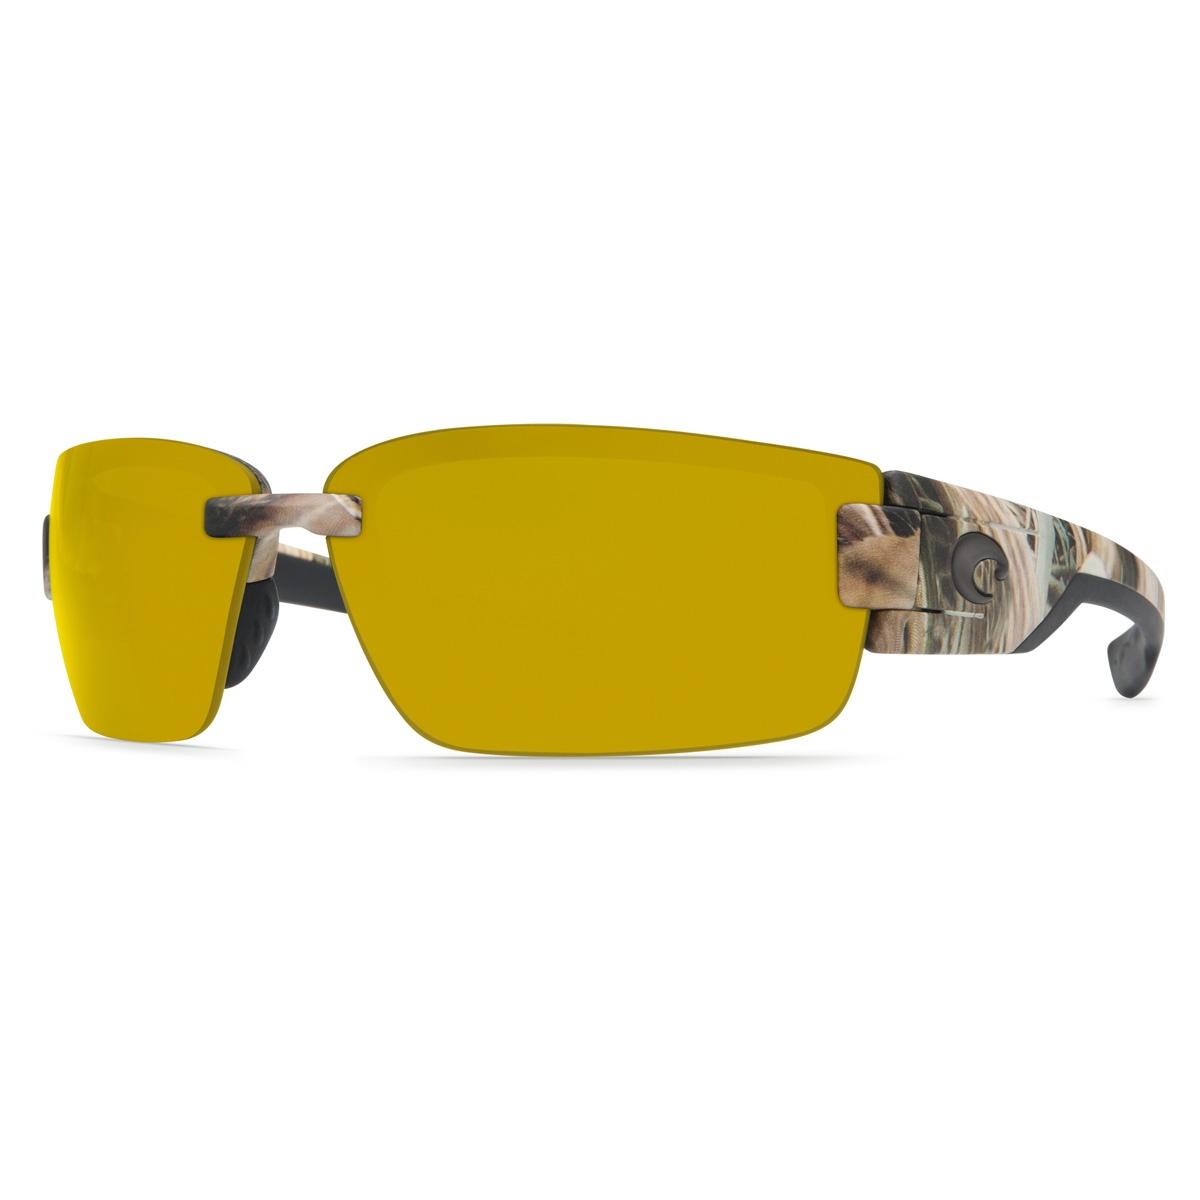 609ac6a579df9 Image of Costa Del Mar Rockport Polarized Sunglasses - Mossy Oak SGB Frame Sunrise  580P